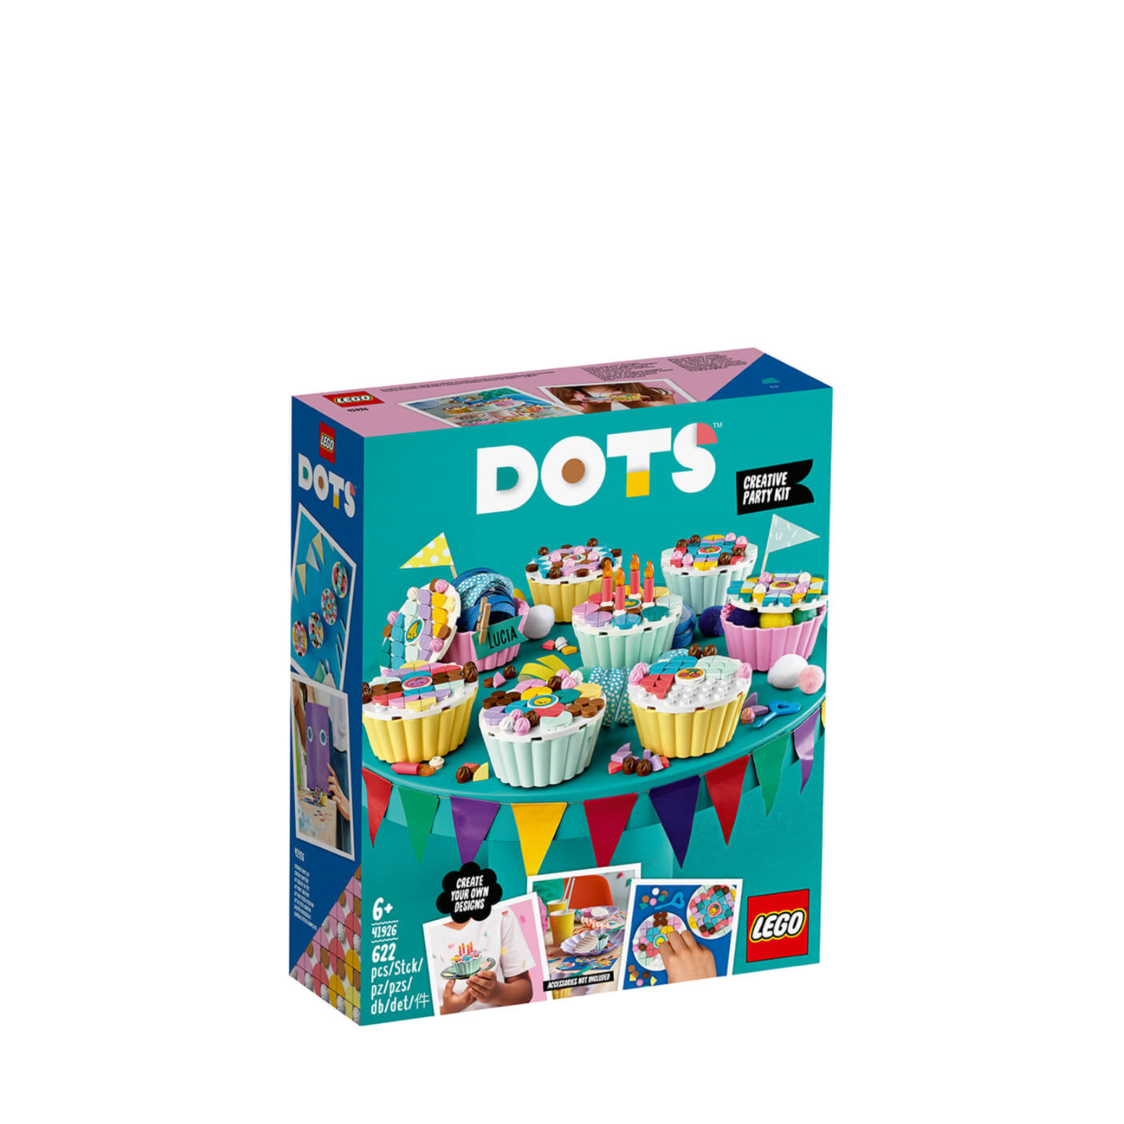 LEGO DOTS - Creative Party Kit 41926